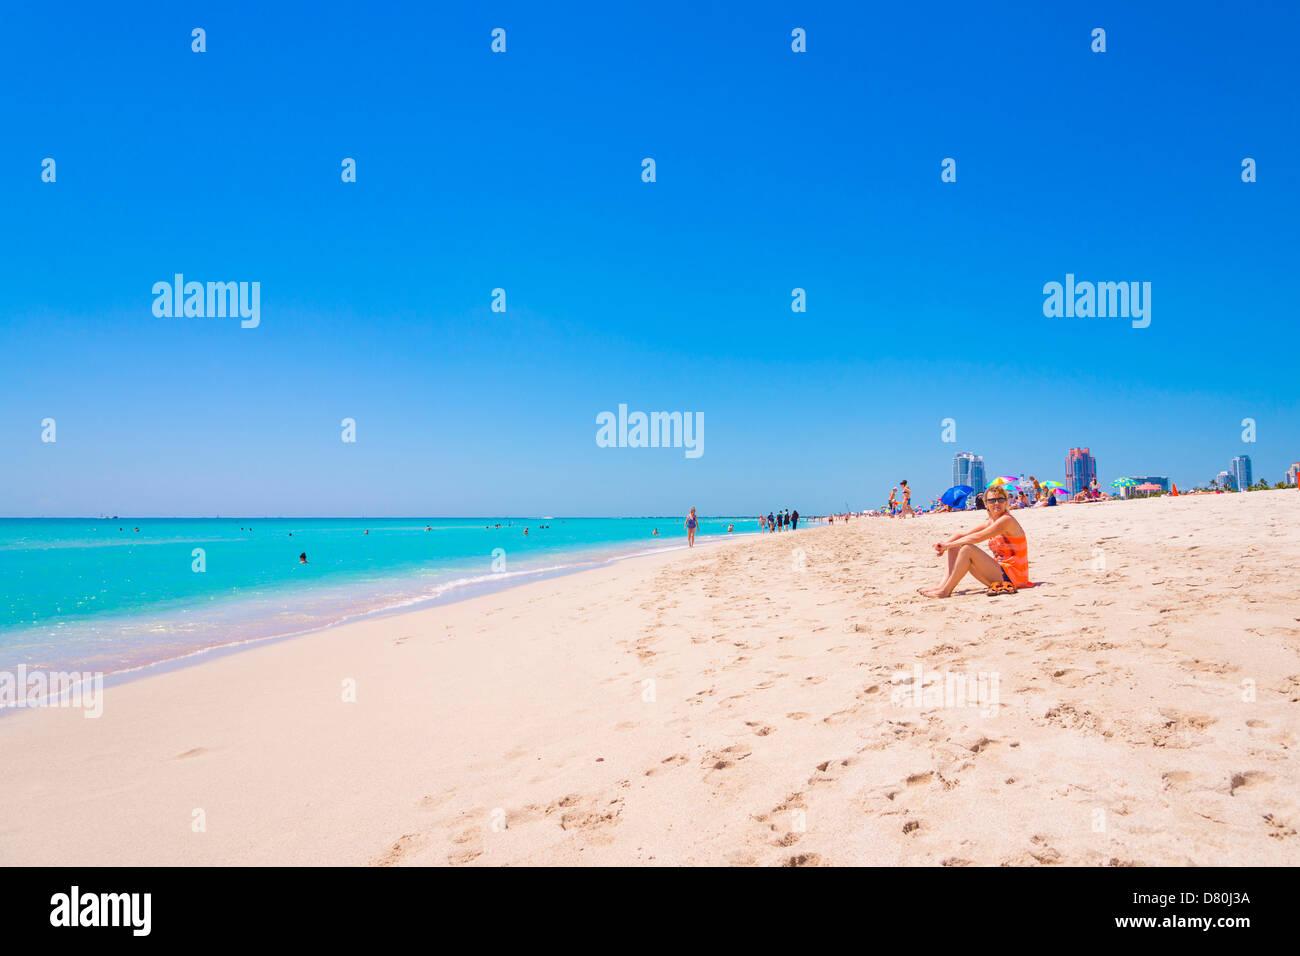 Caucasian woman, 45 years, sitting on a beach, South Beach, Miami Beach, Florida, USA - Stock Image